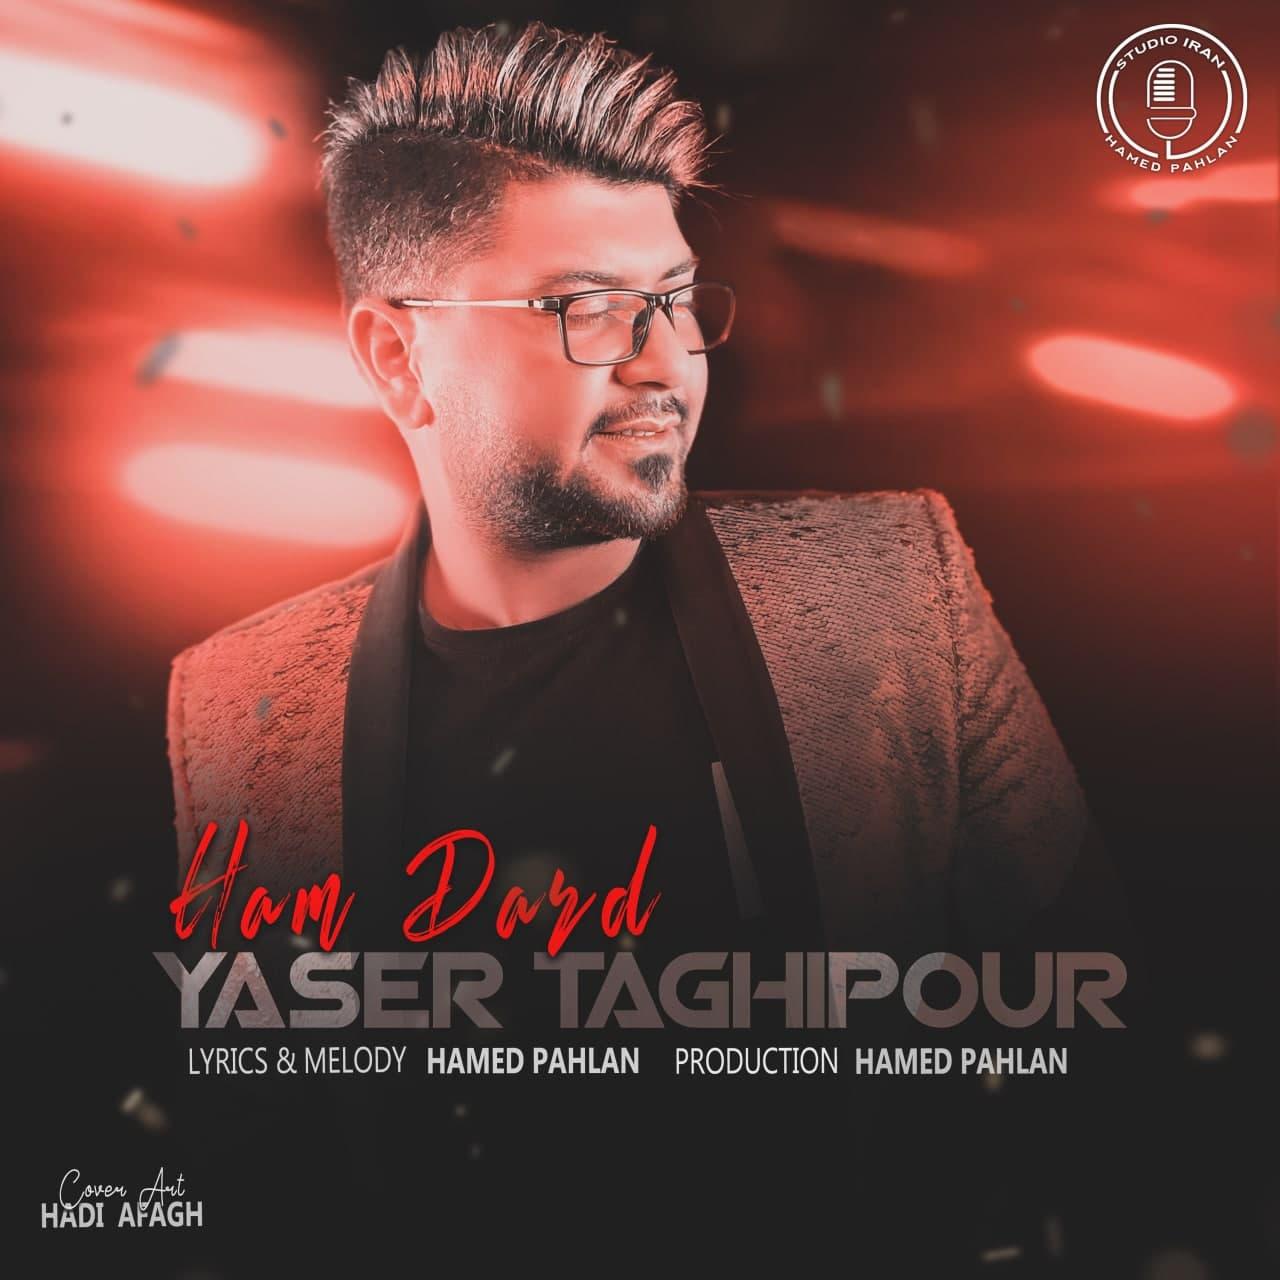 Yaser Taghipour – Hamdard